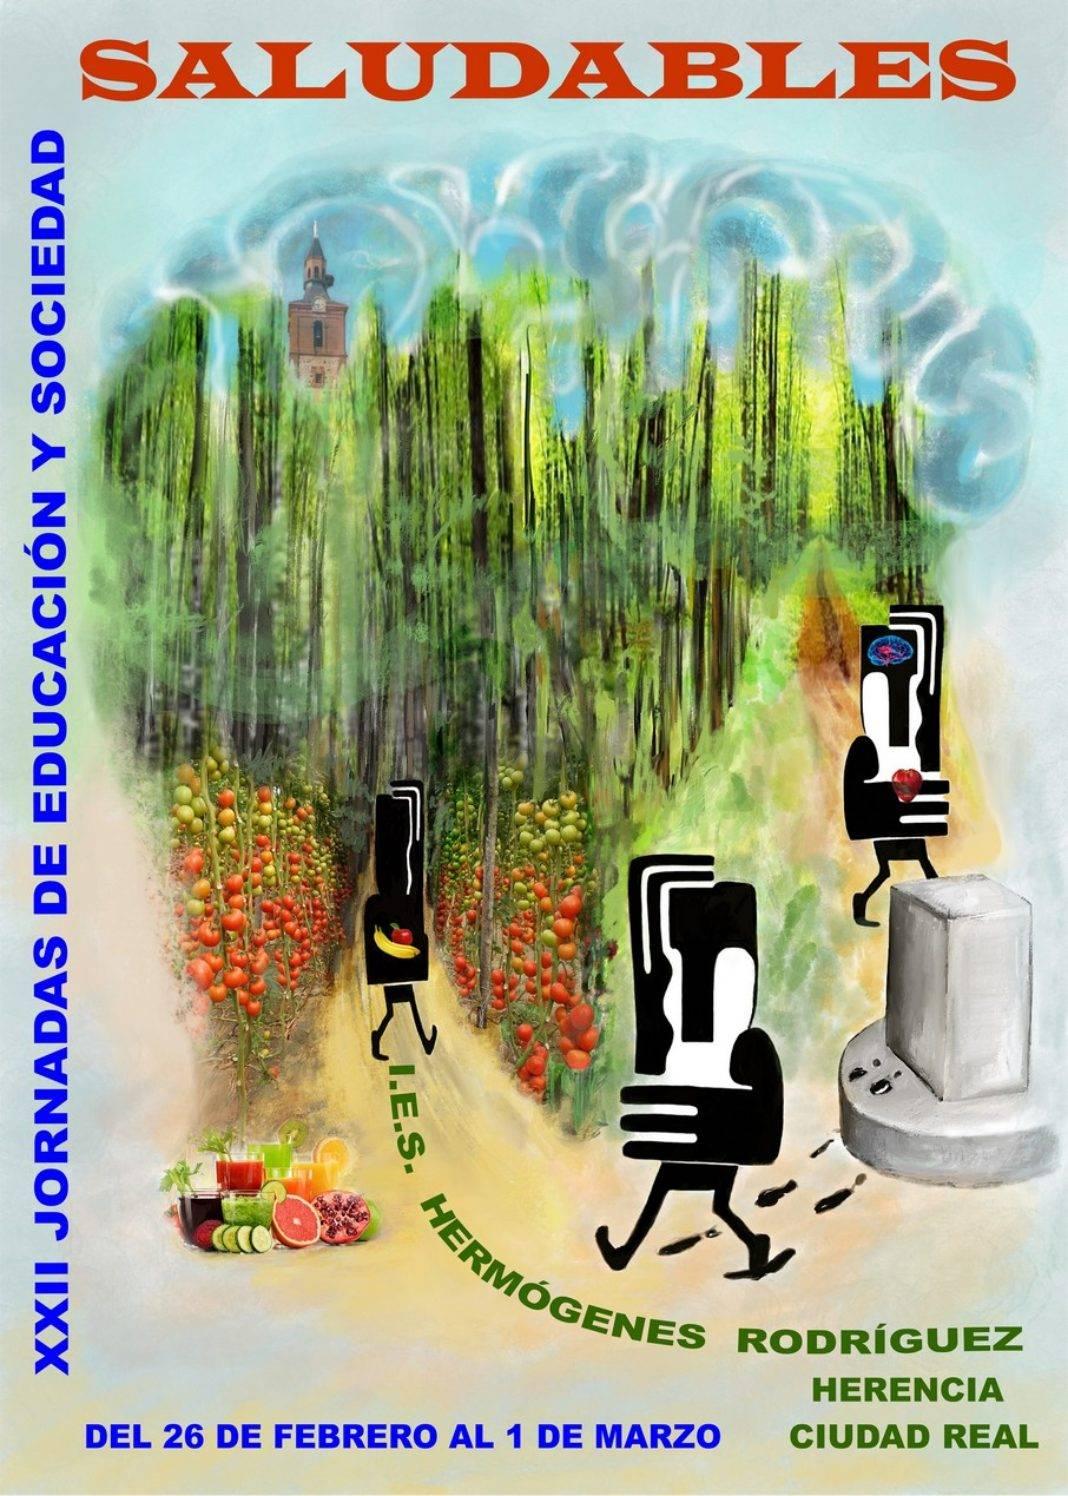 Las XXII Jornadas del IES Hermógenes Rodríguez dedicadas a hábitos saludables 10